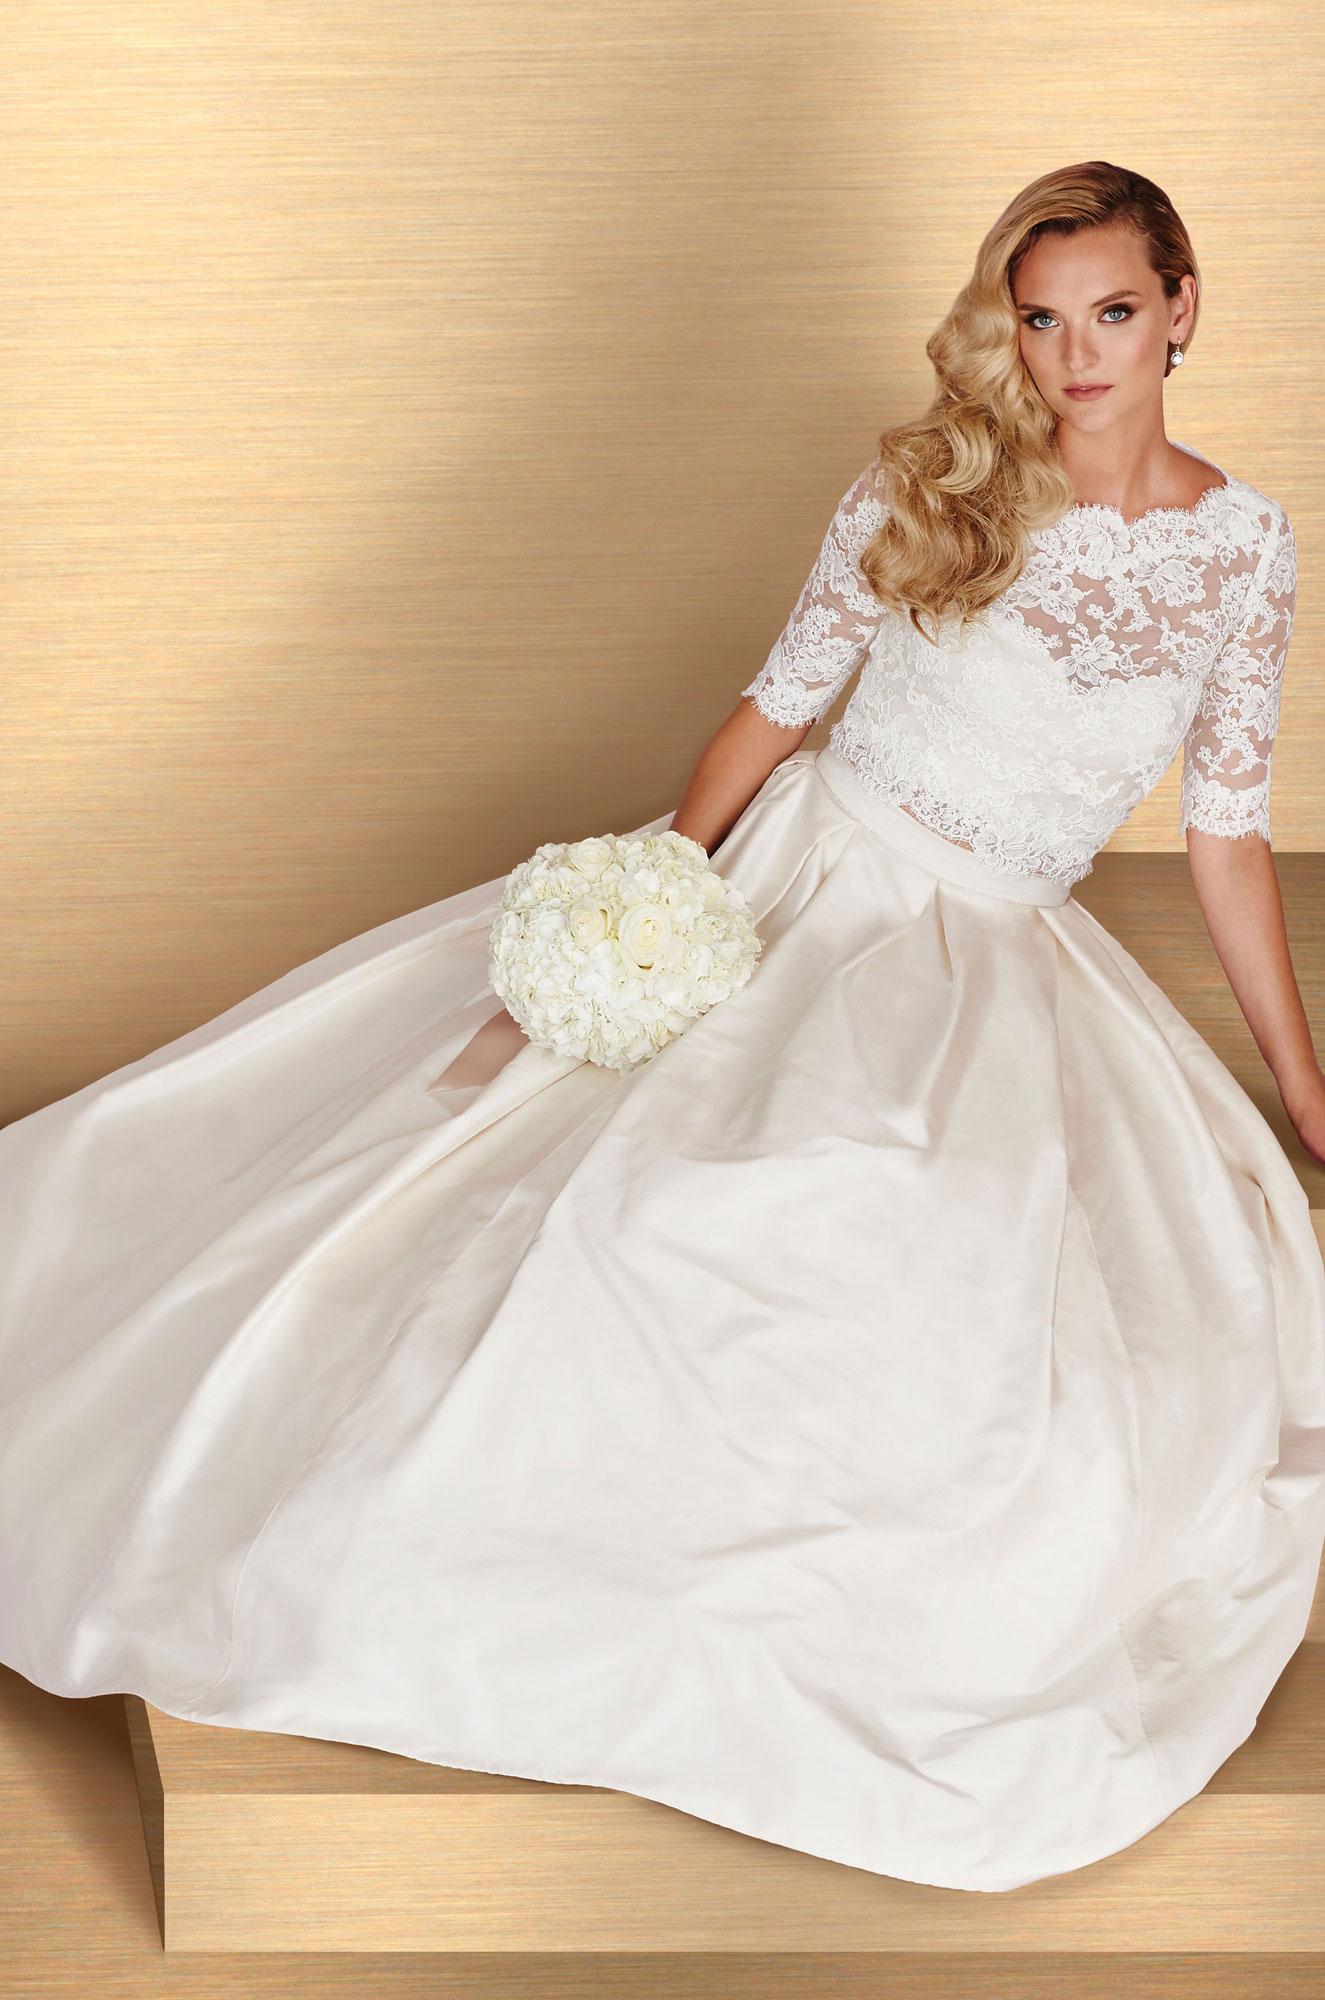 Paloma-Blanca-4667-3-Piece-Gown-Salon-Sample_6189A.jpg